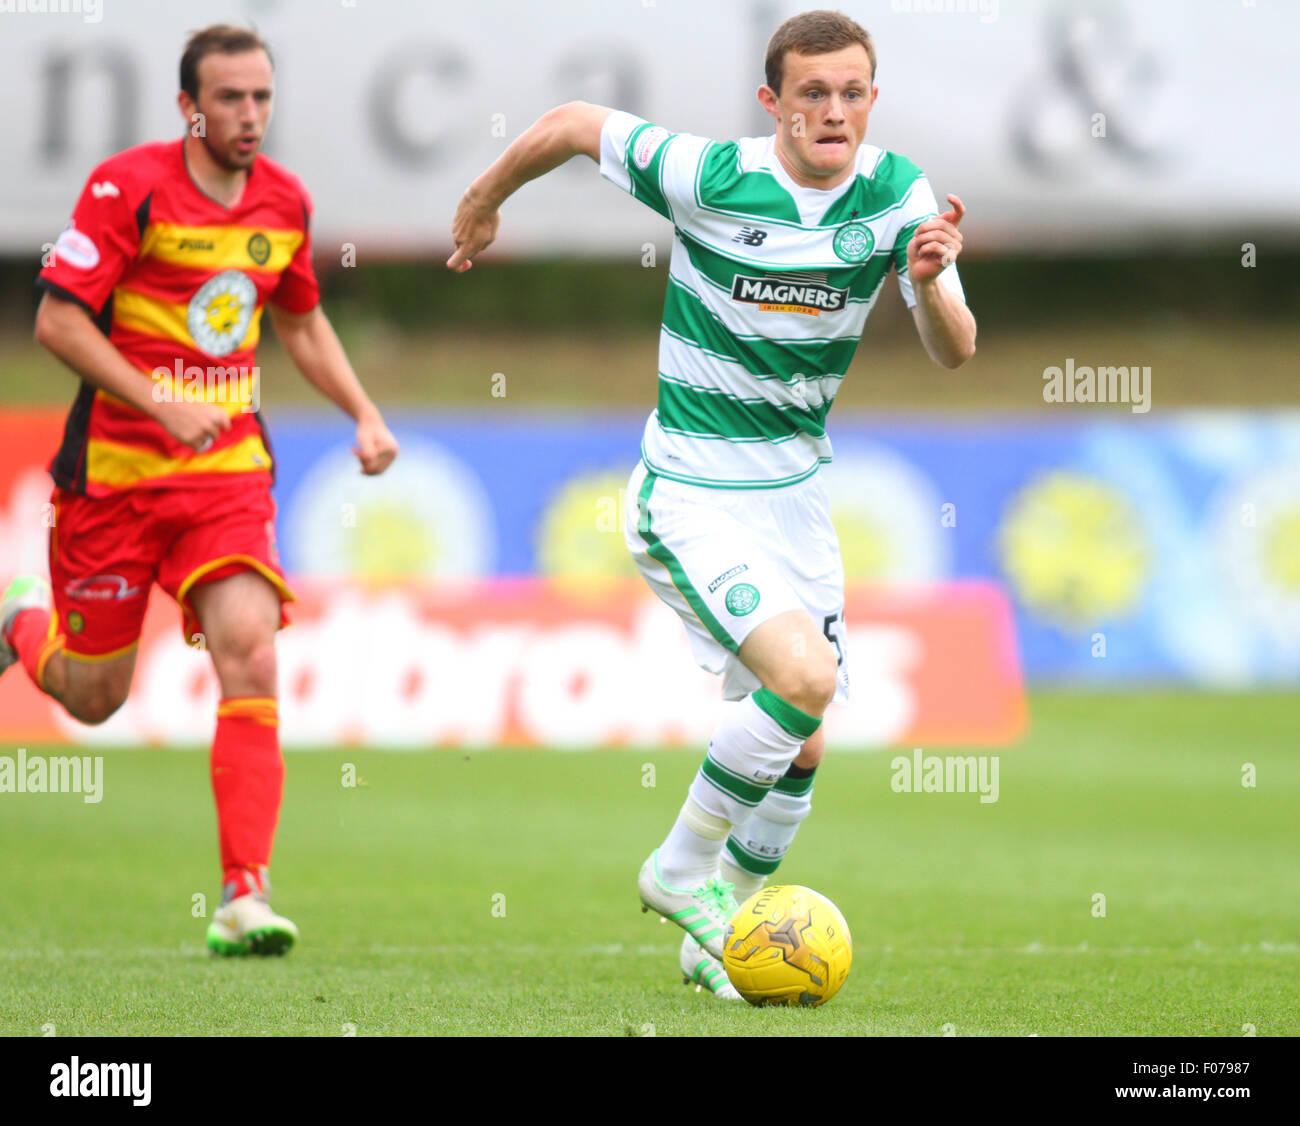 Glasgow, Scotland. 09th Aug, 2015. Ladbrokes Scottish Premiership. Partick Thistle versus Celtic. Liam Henderson - Stock Image